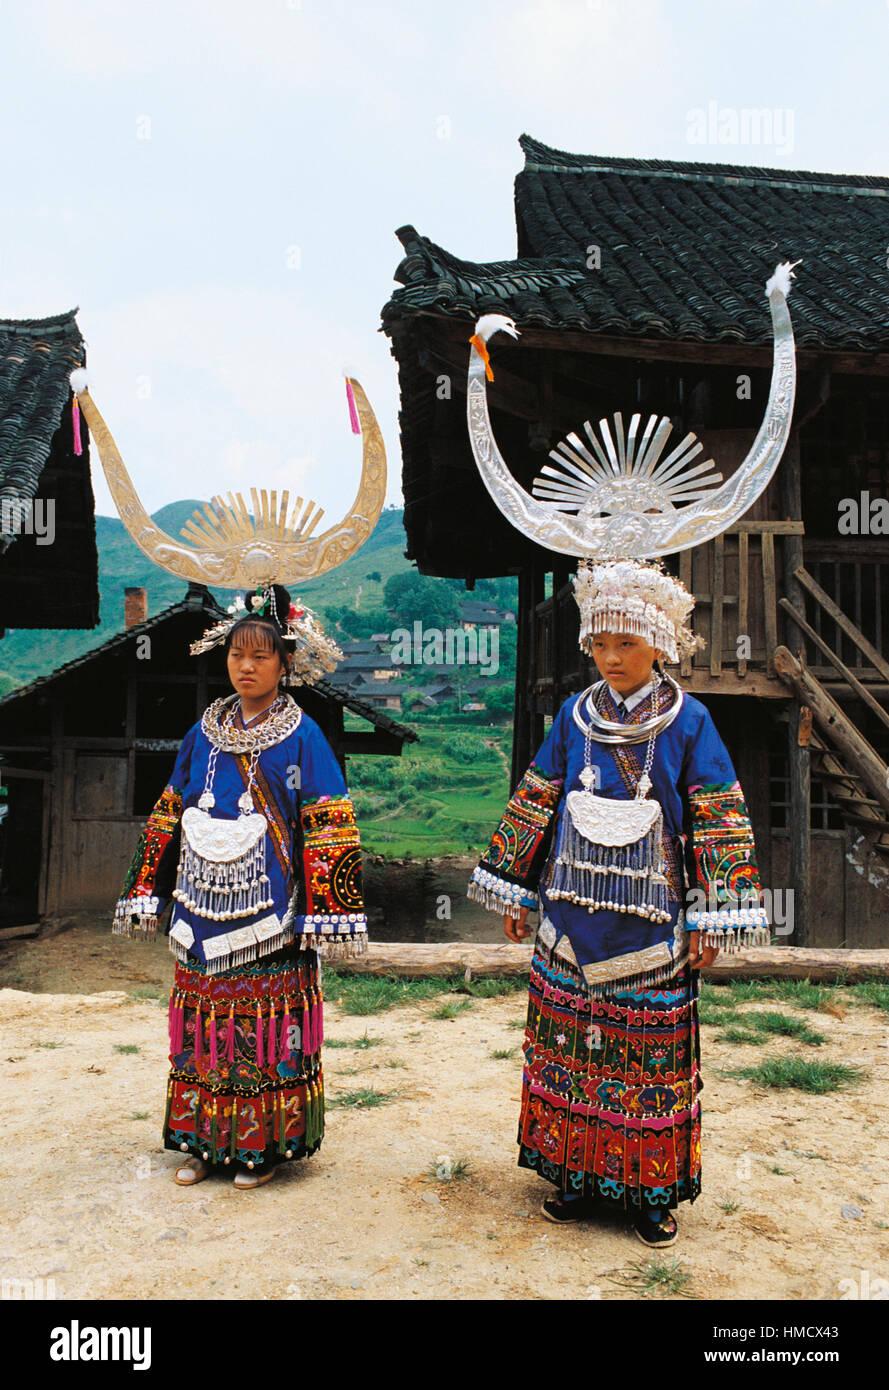 Las niñas Miao en traje tradicional, Jing Ming, China. Imagen De Stock